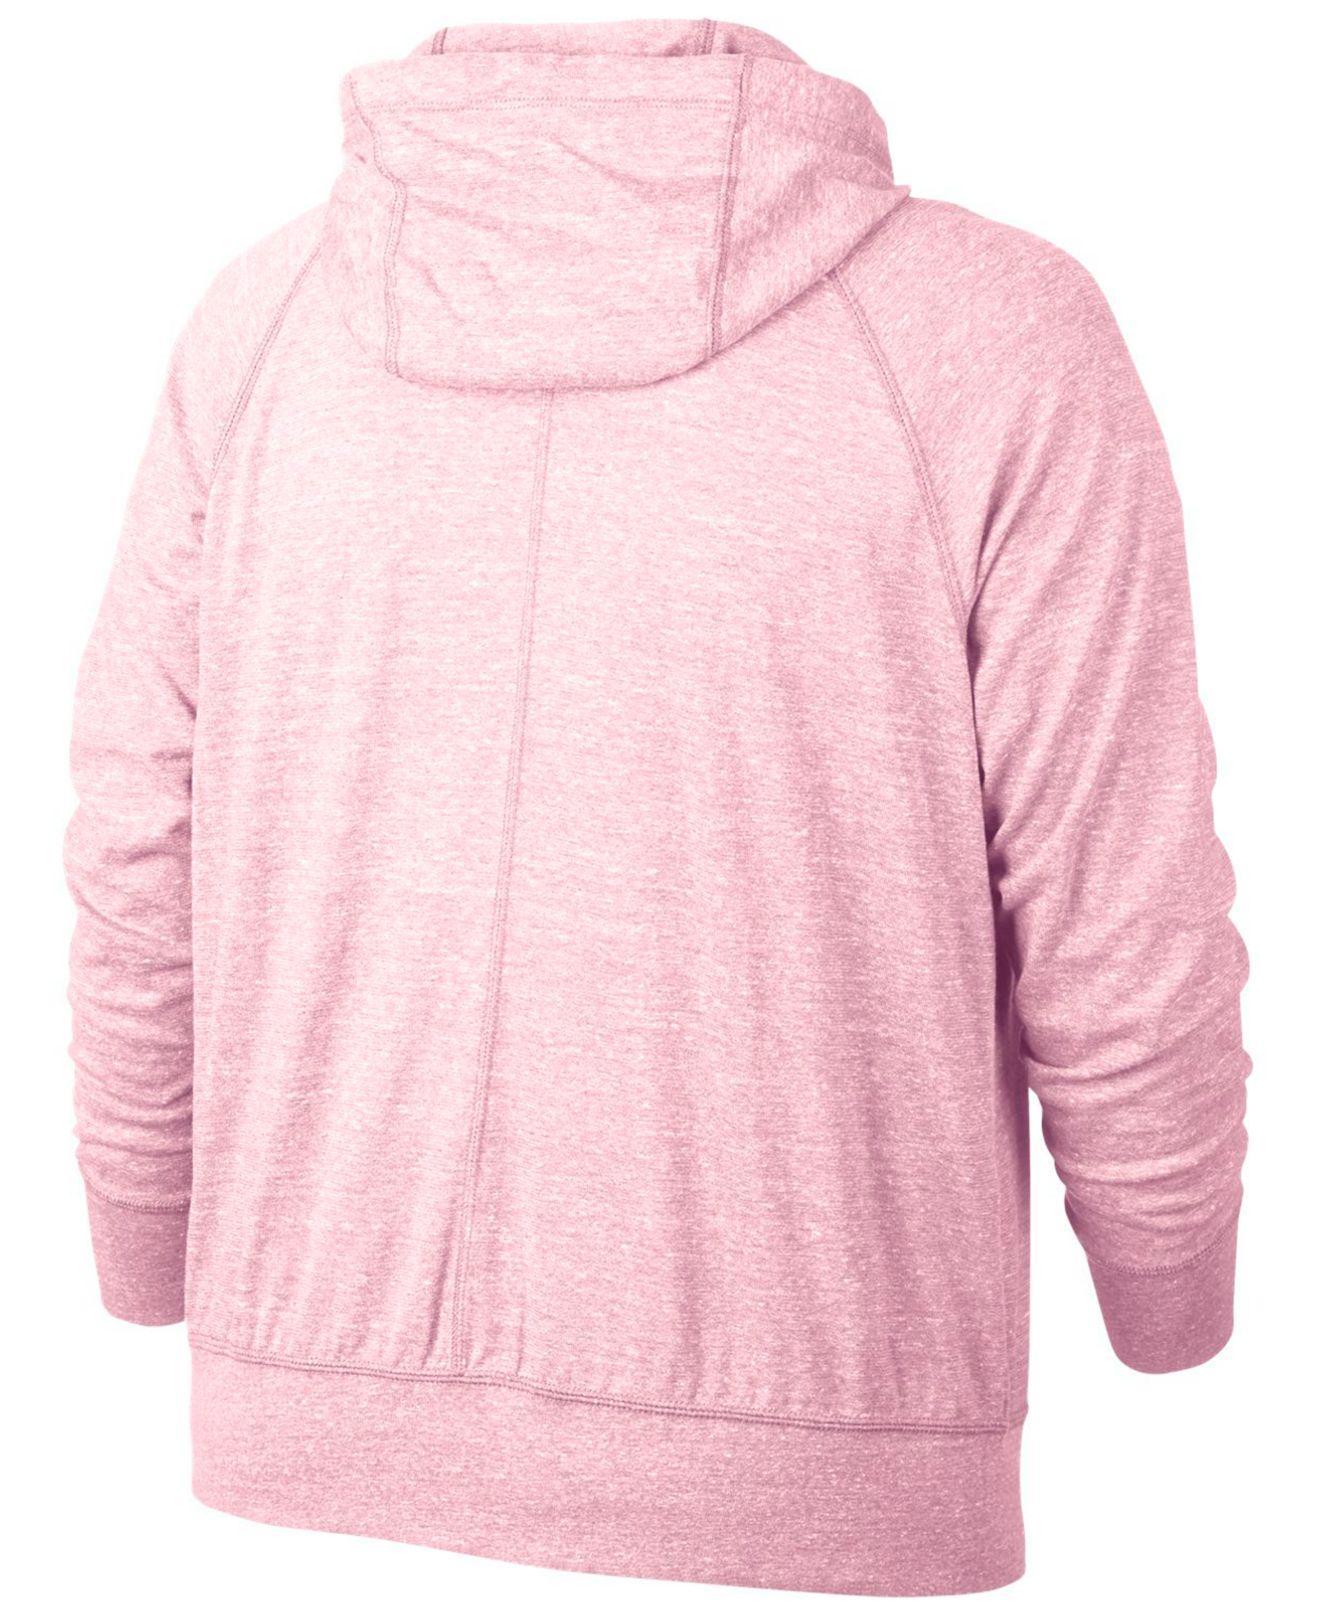 80b3660a95df Lyst - Nike Plus Size Sportswear Gym Vintage Hoodie in Pink